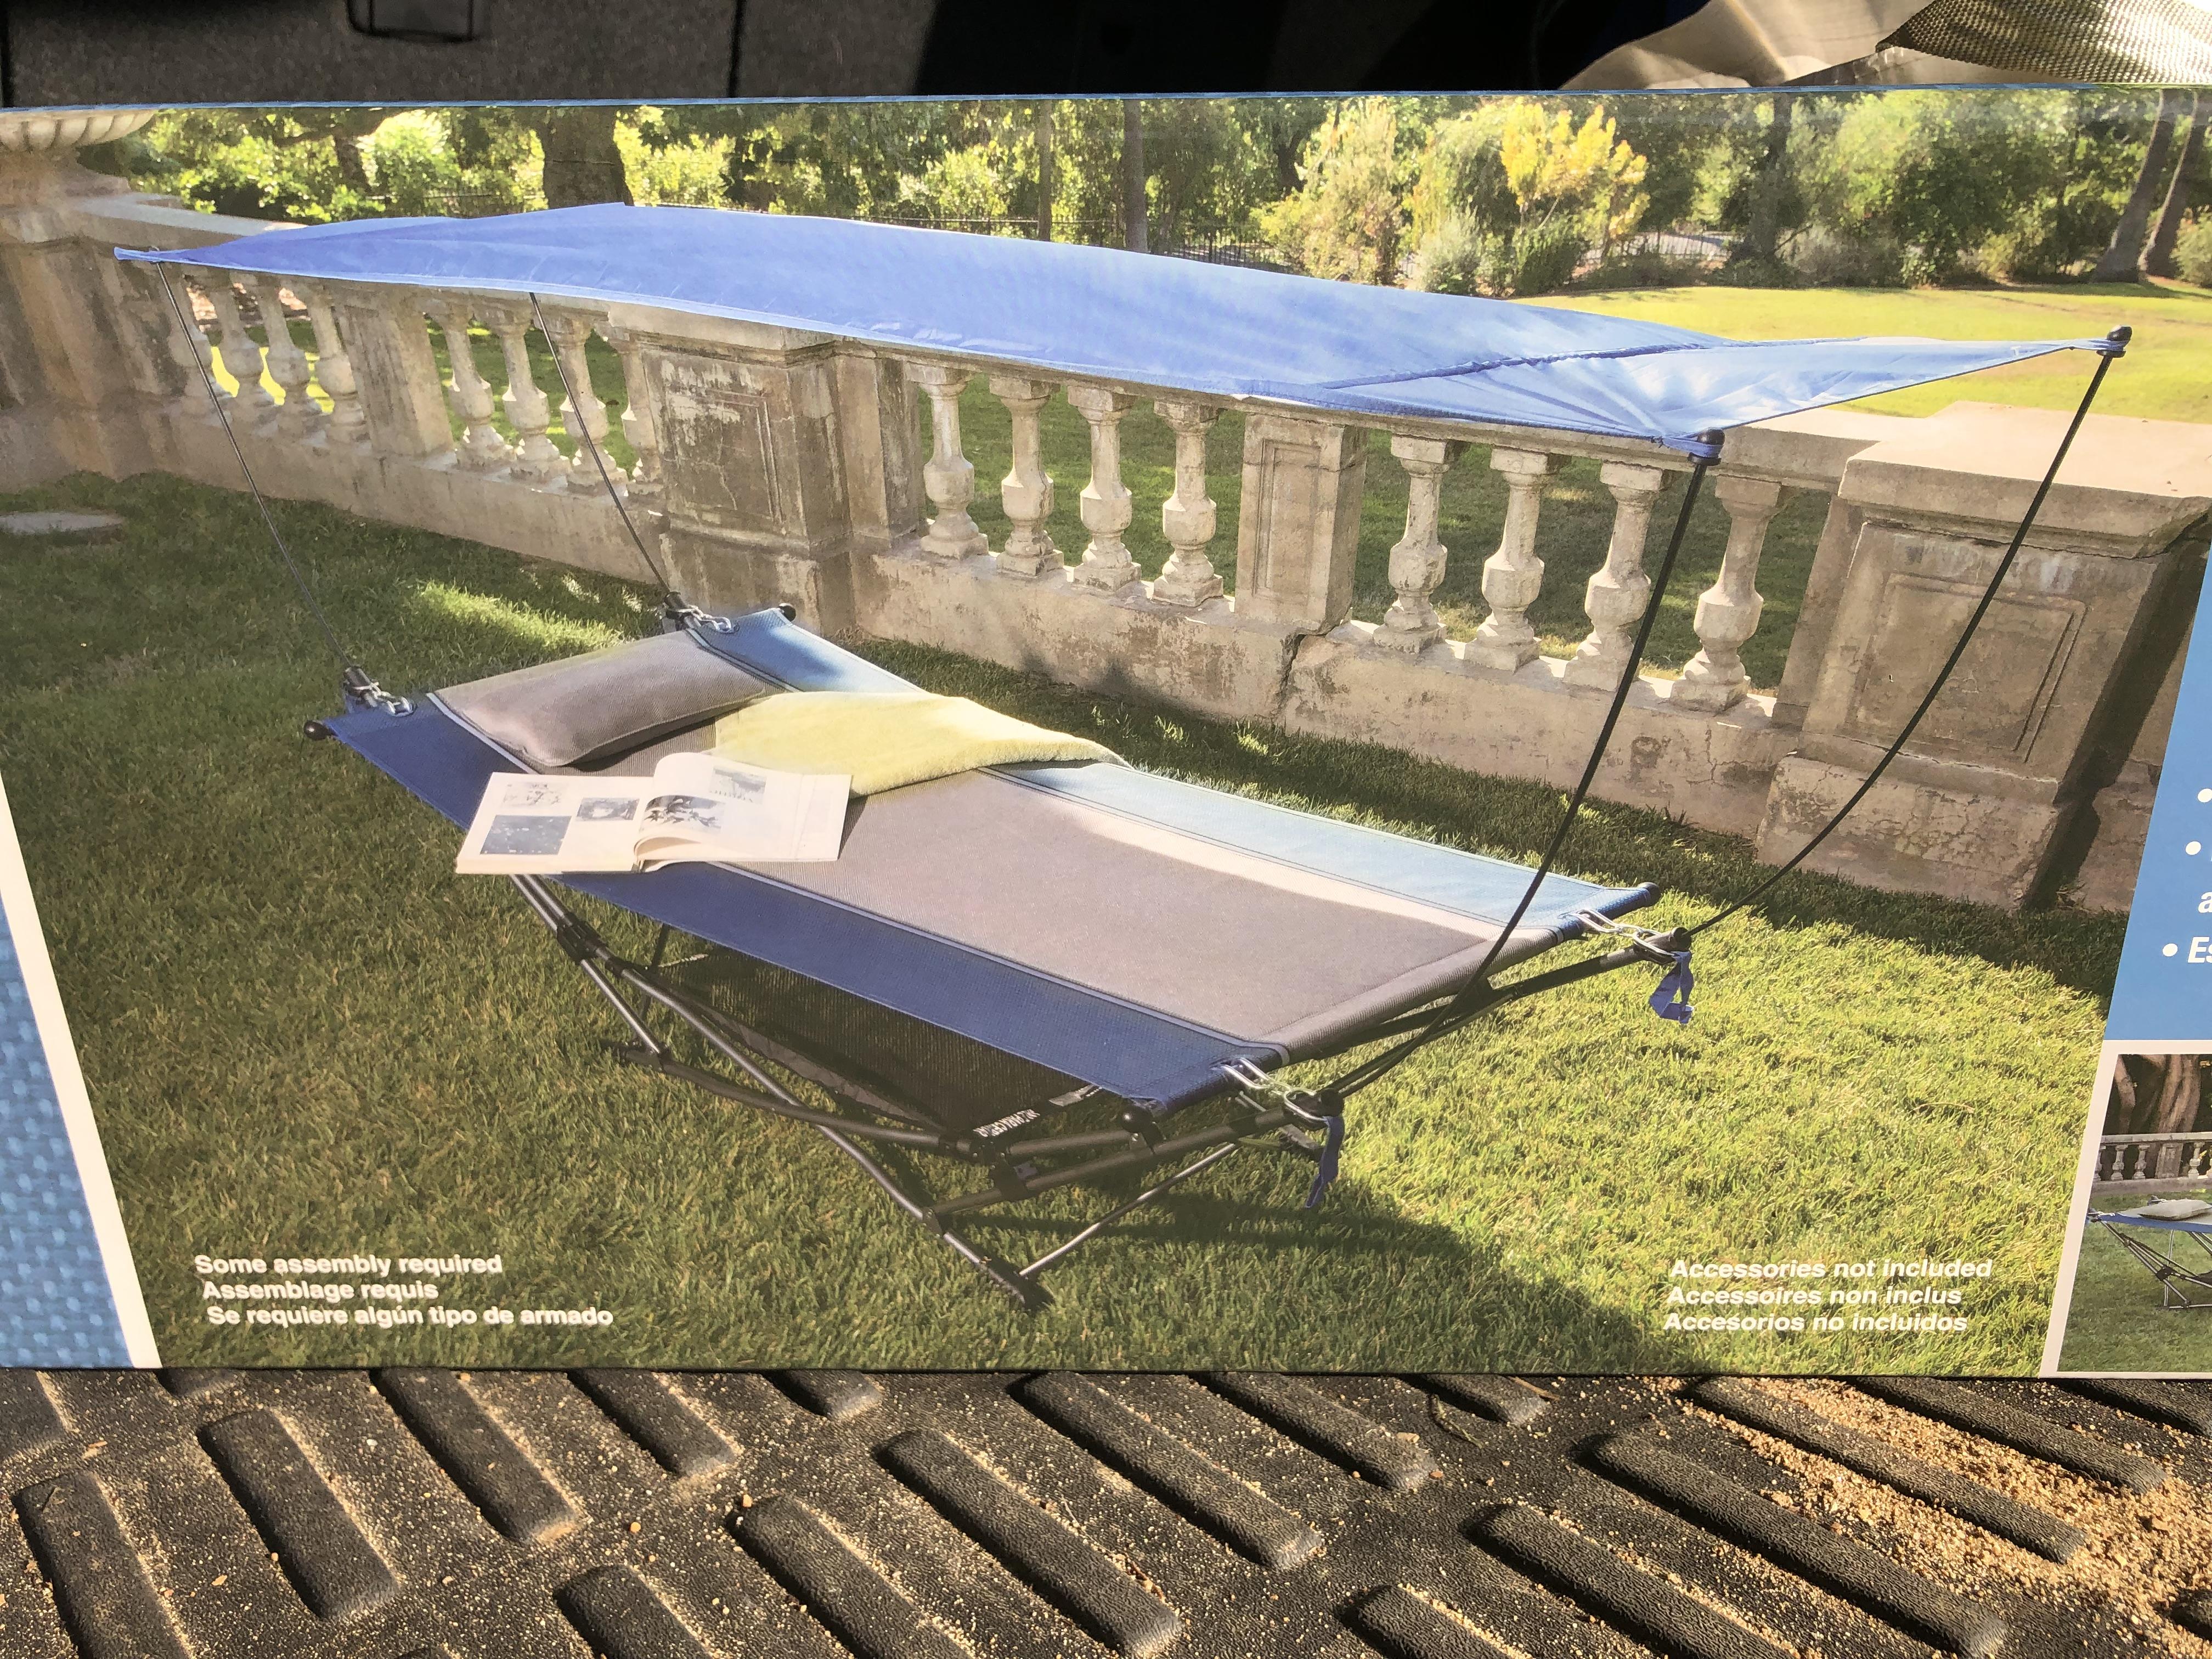 Costco Folding Hammock With Removable Canopy Ymmv 40 Slickdeals Net